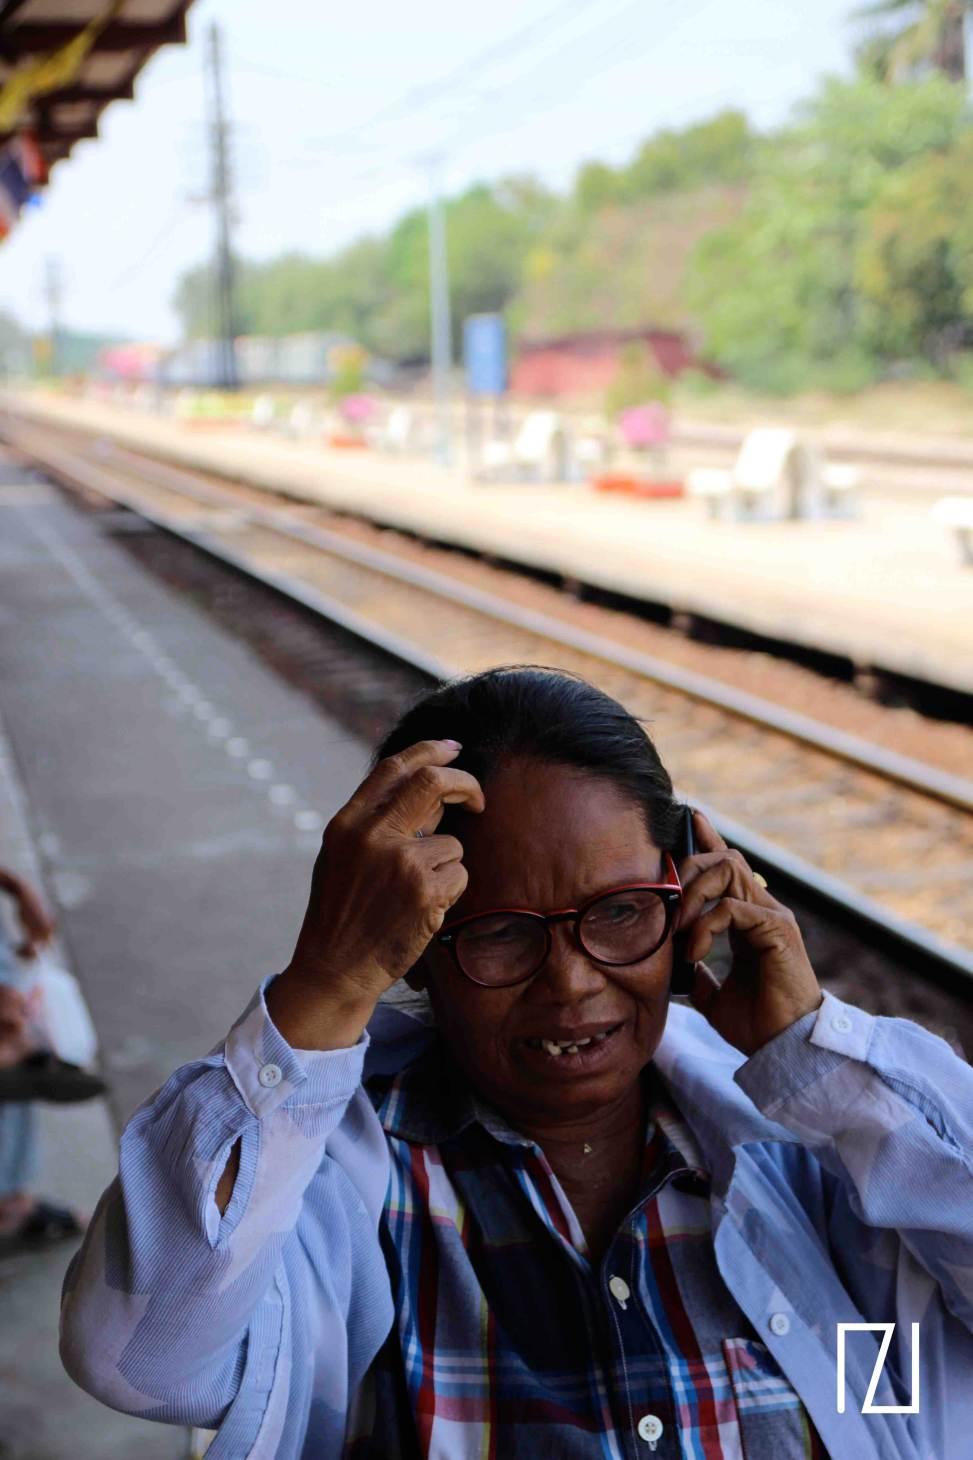 Madame au téléphone